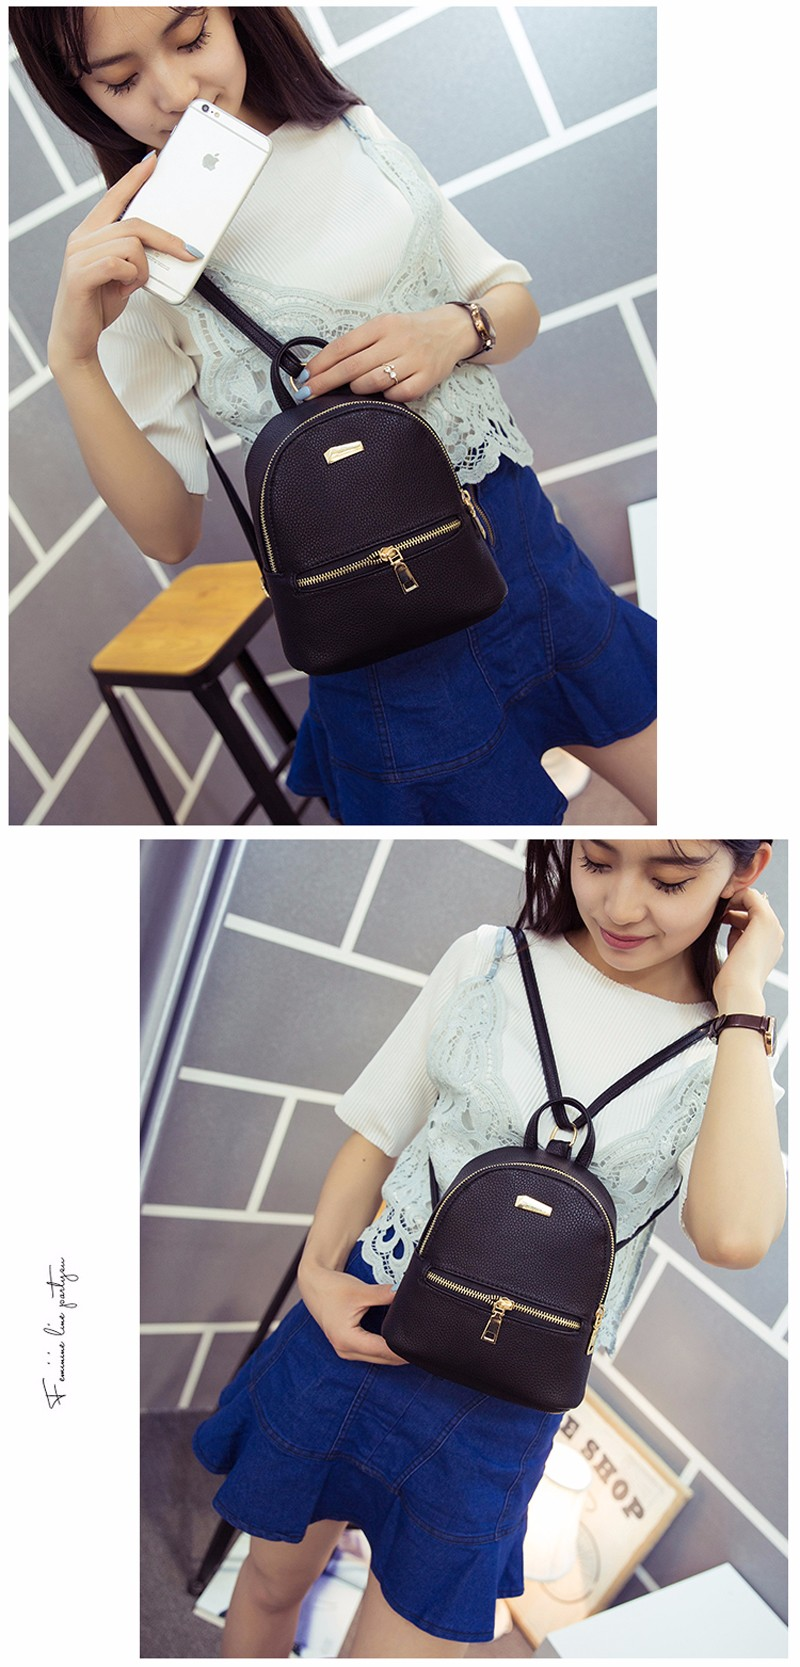 Small Fashion Rucksack Hotsale Women Shopping Purse Ladies Joker Bookbag Travel Bag Student school Backpacks Mini Women Backpack 6